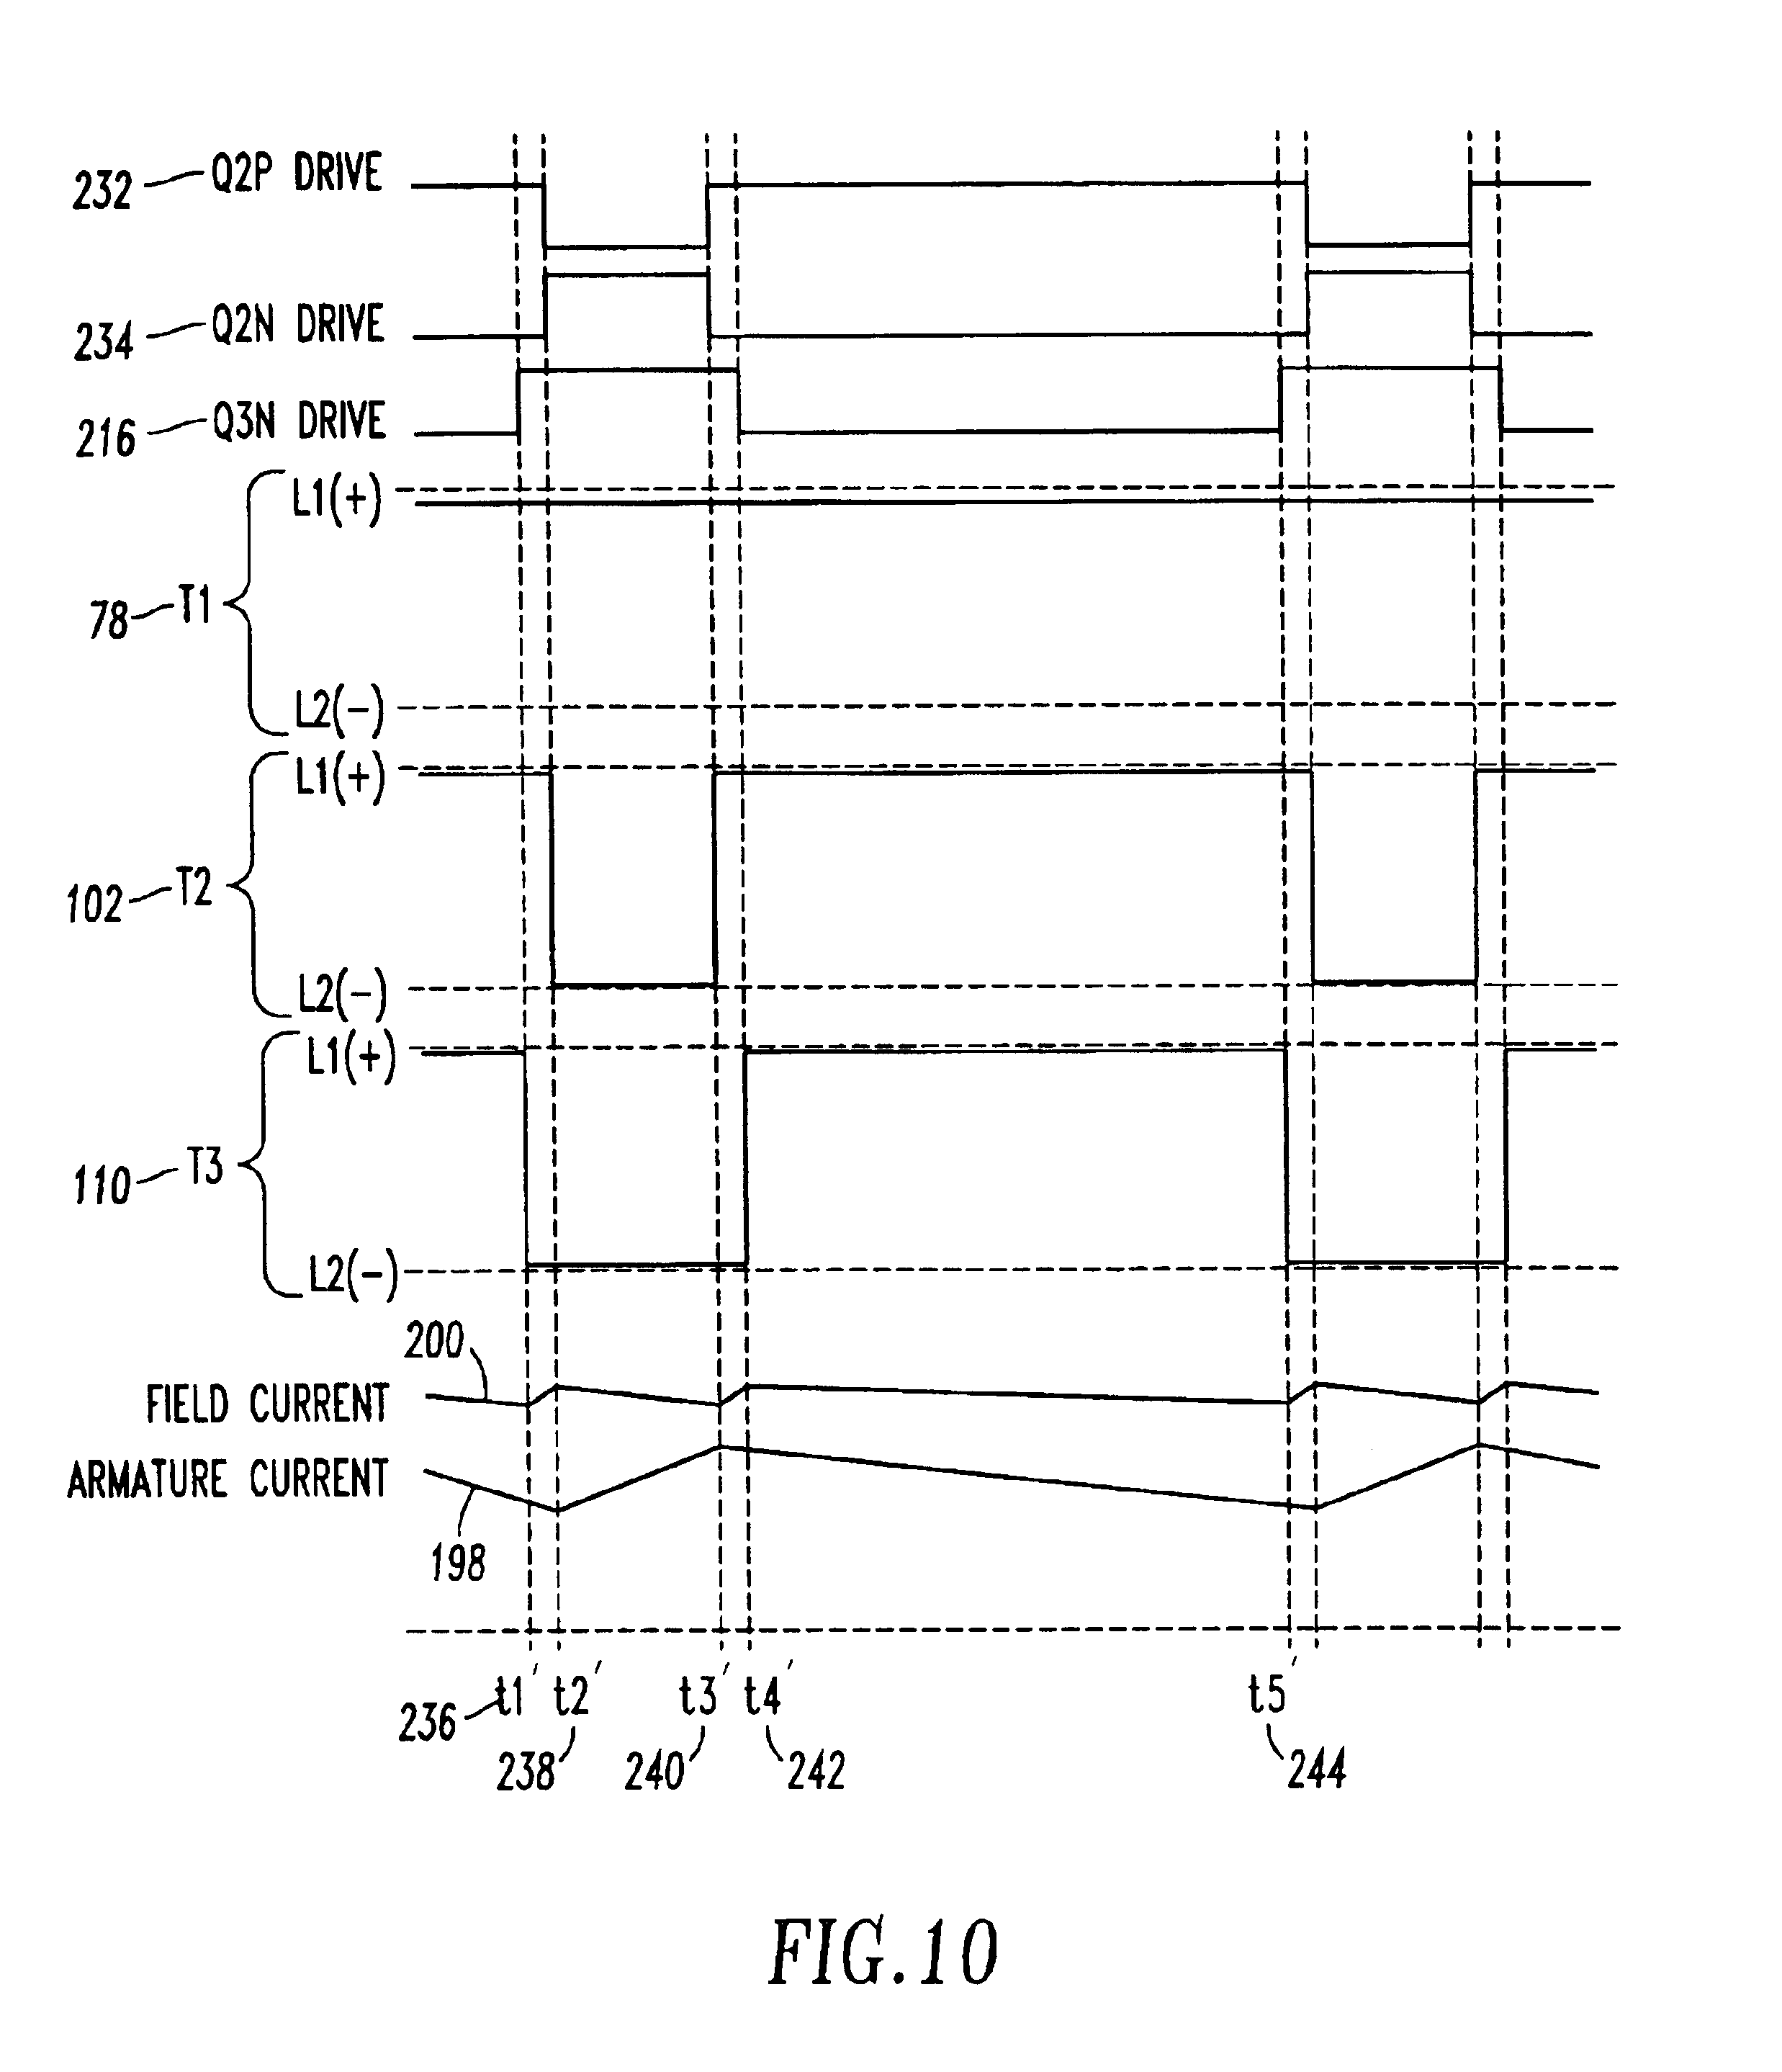 Jvc Kd S590 Manual Wiring Diagram Master Blogs Avx77 Car Stereo Hdr60 S79bt R680s